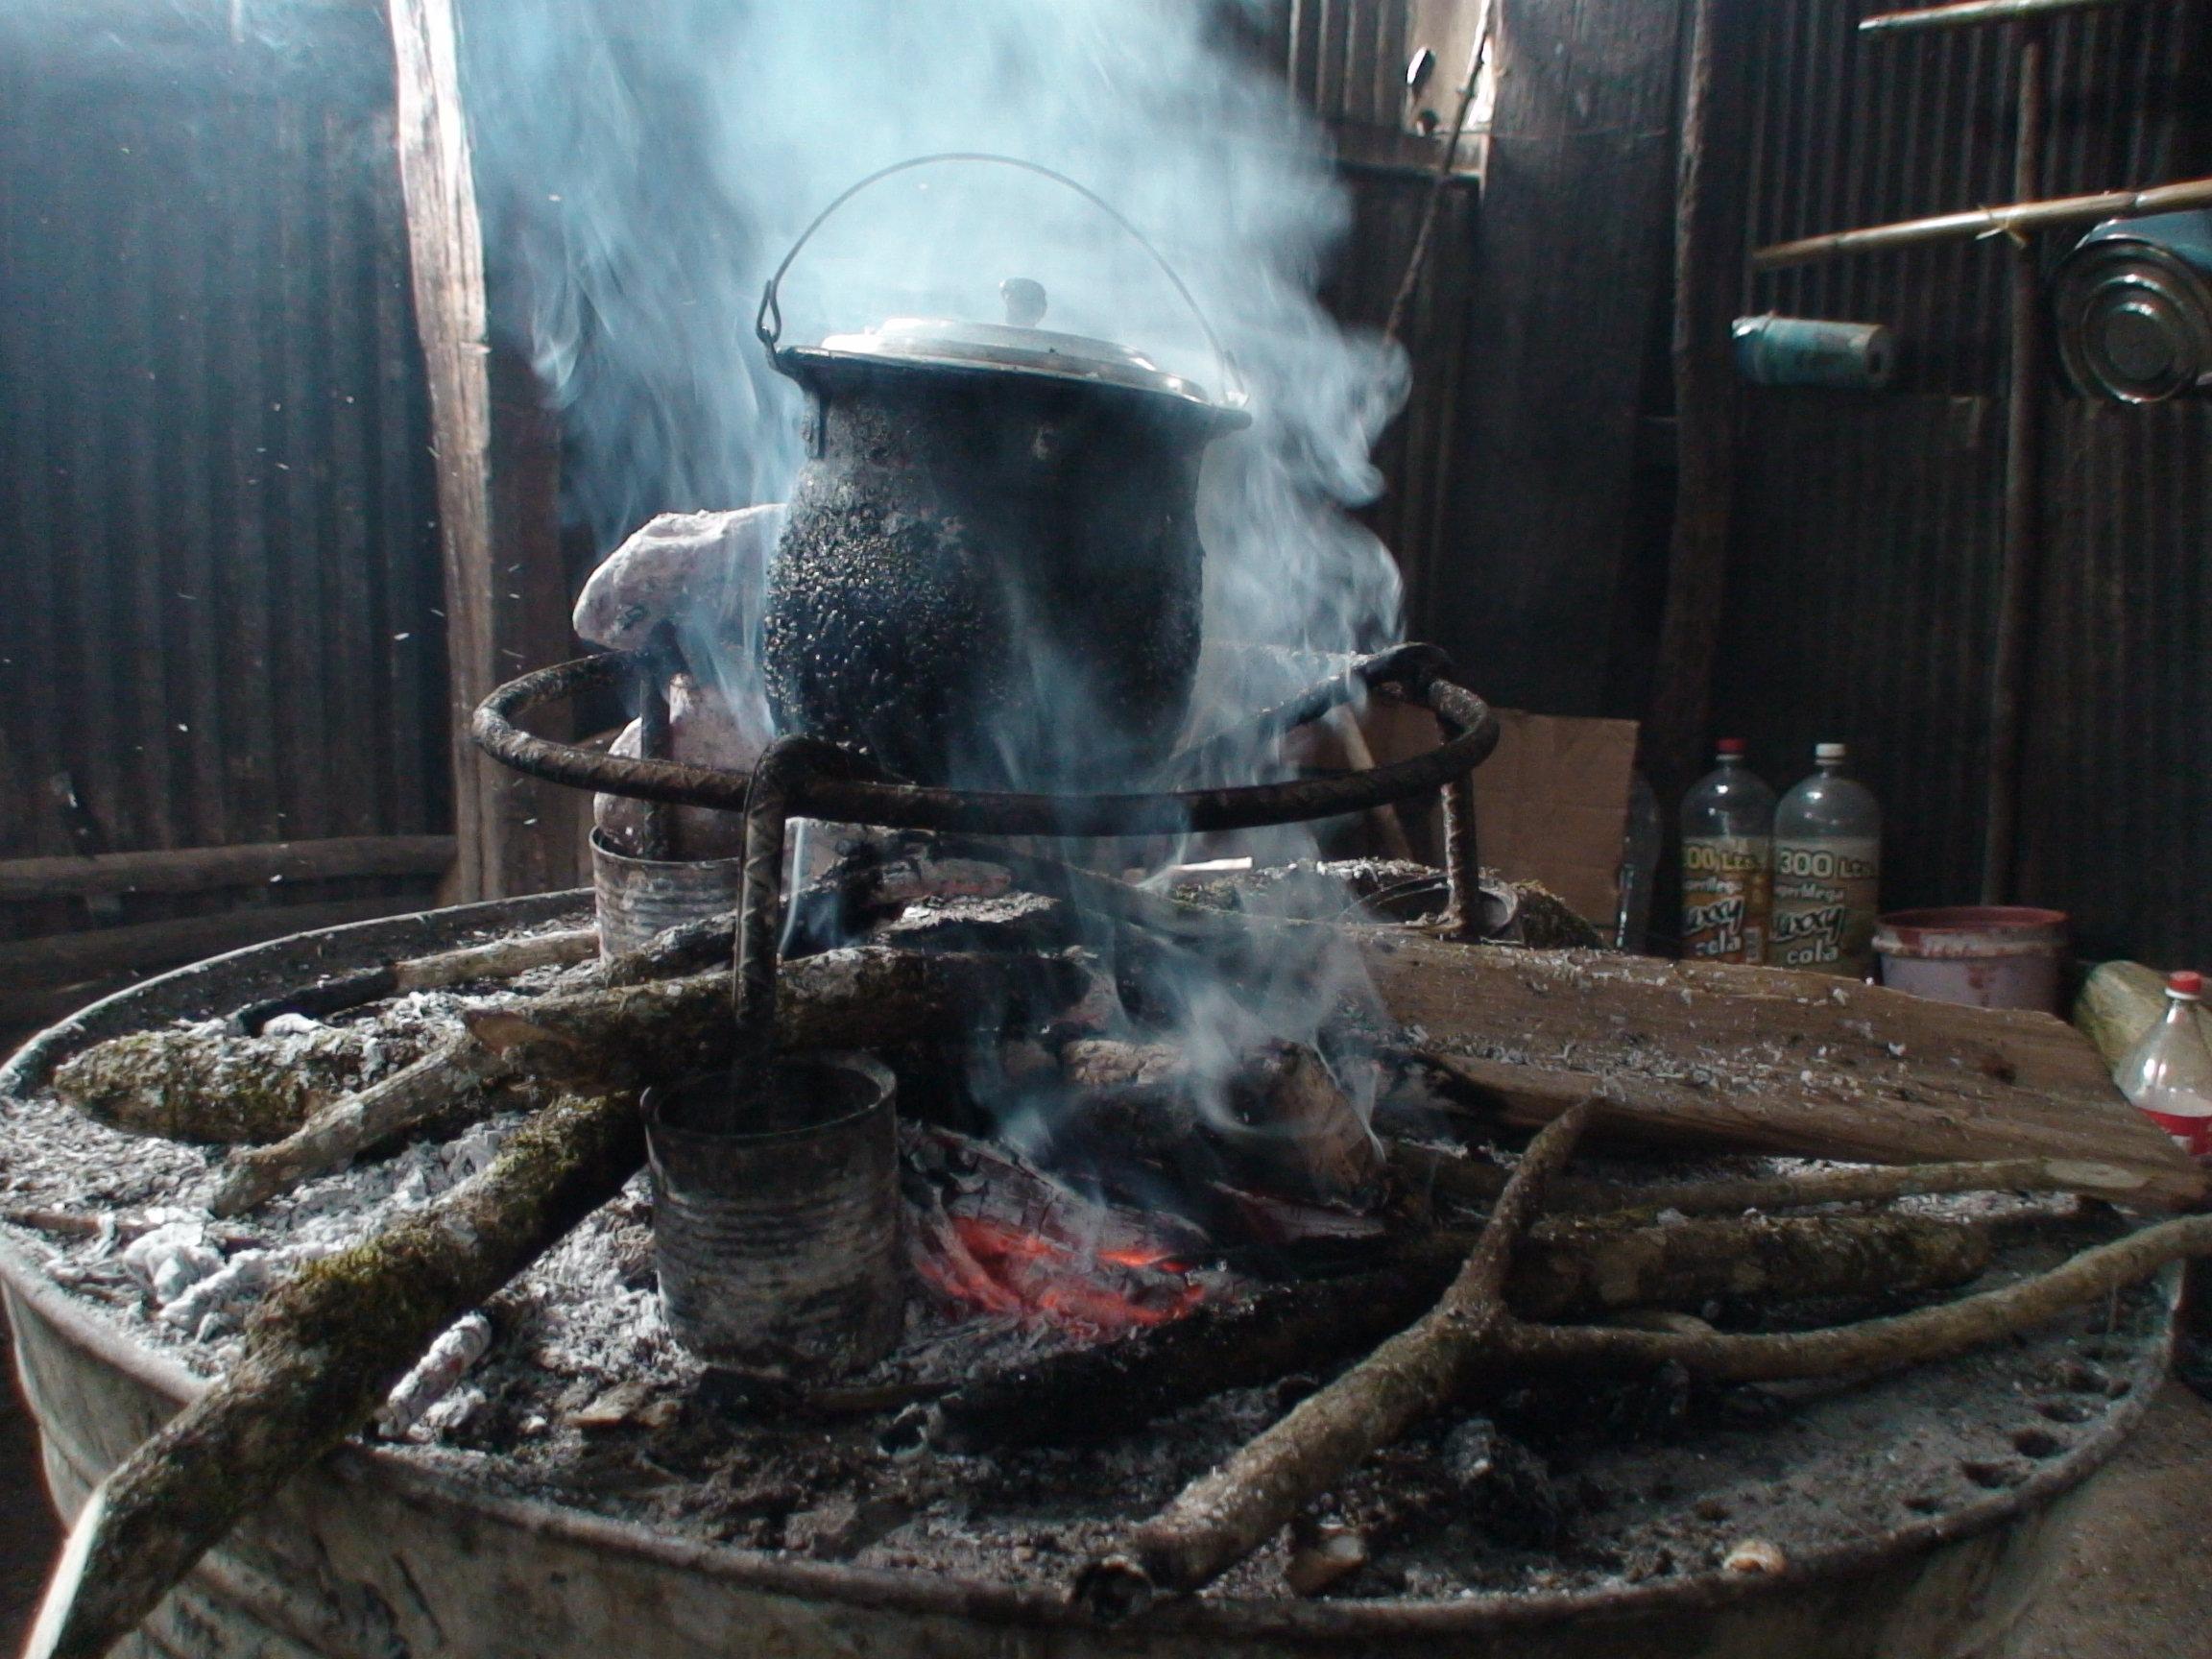 Mexico indoor cookstove